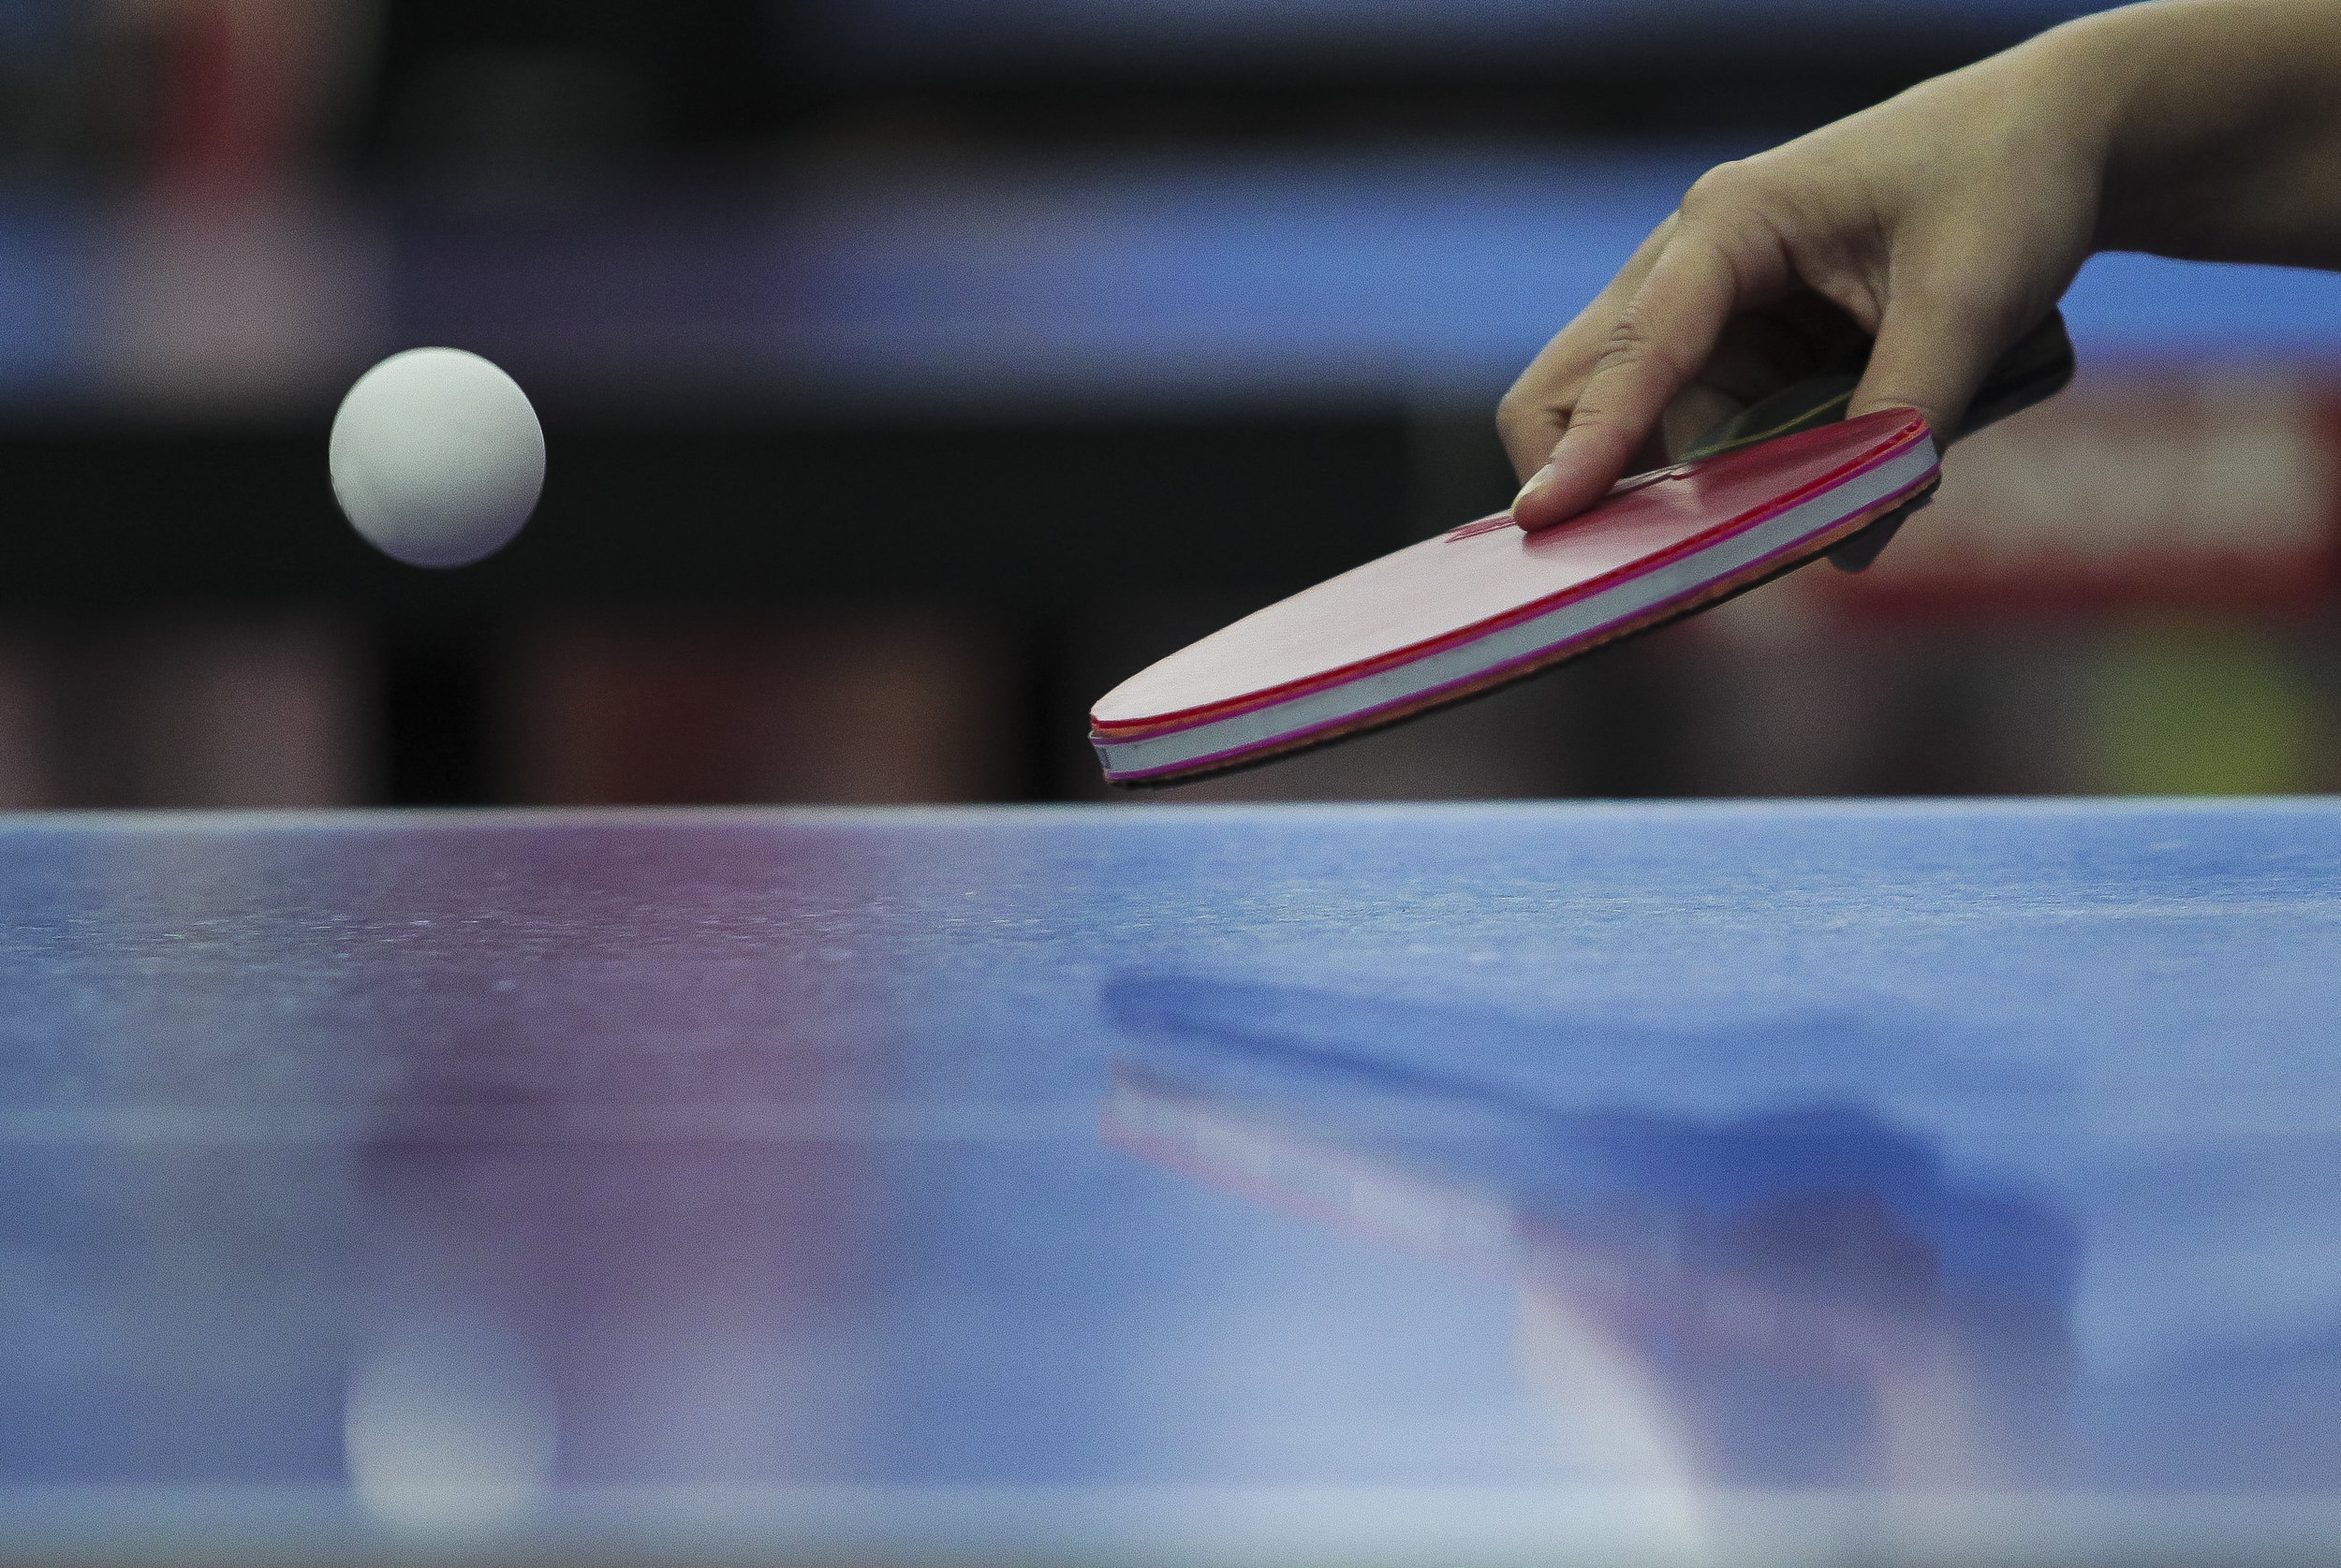 ping pong ball and paddle.jpg